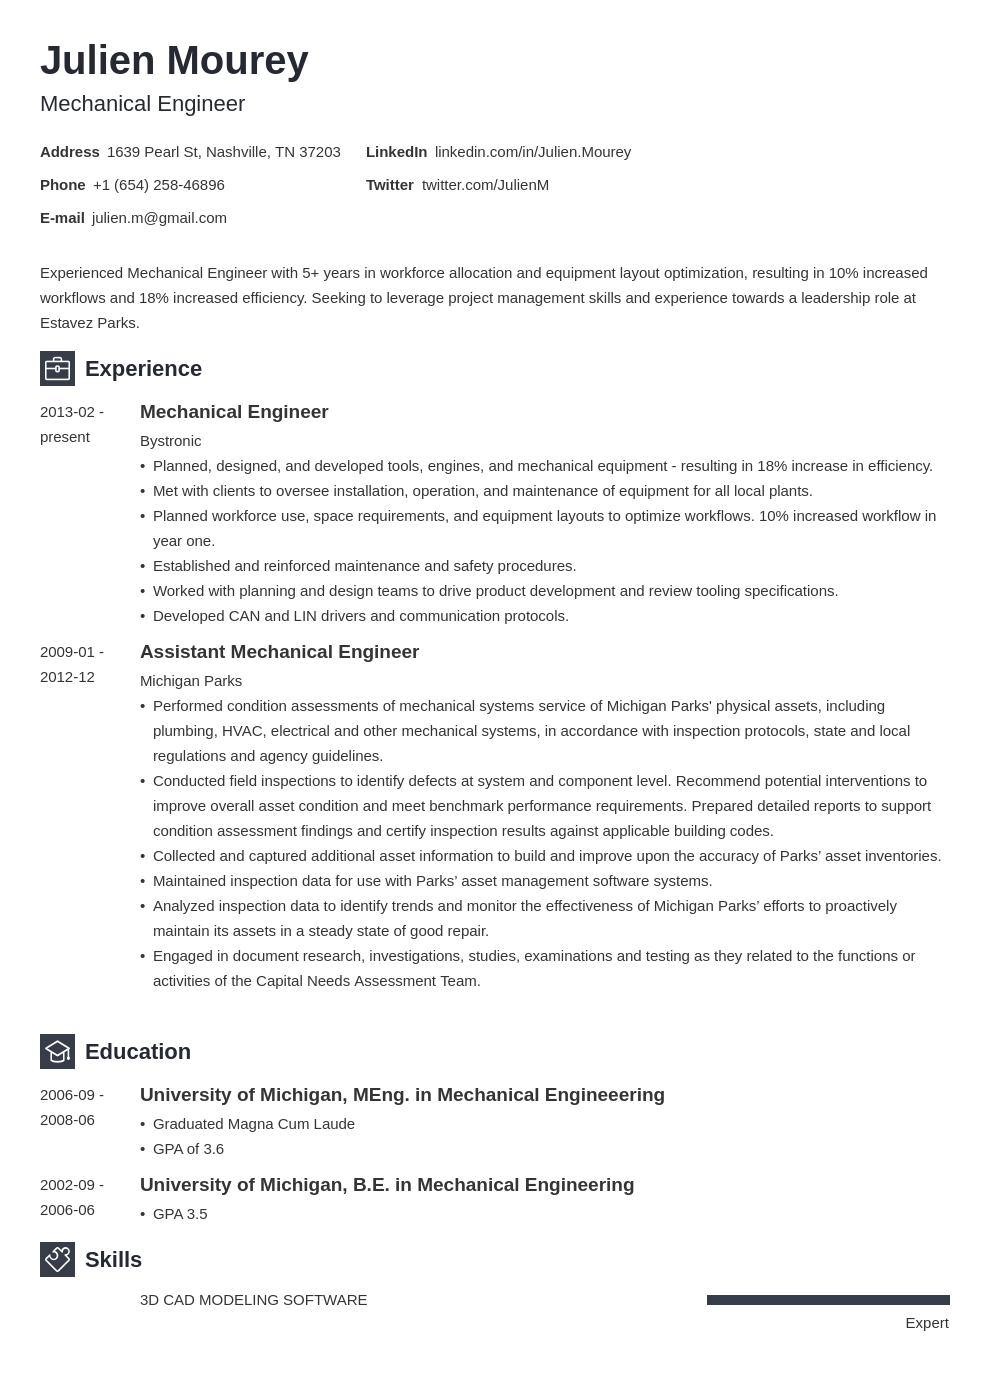 Mechanical Engineering Resume Template Newcast Mechanical Engineer Resume Engineering Resume Templates Engineering Resume